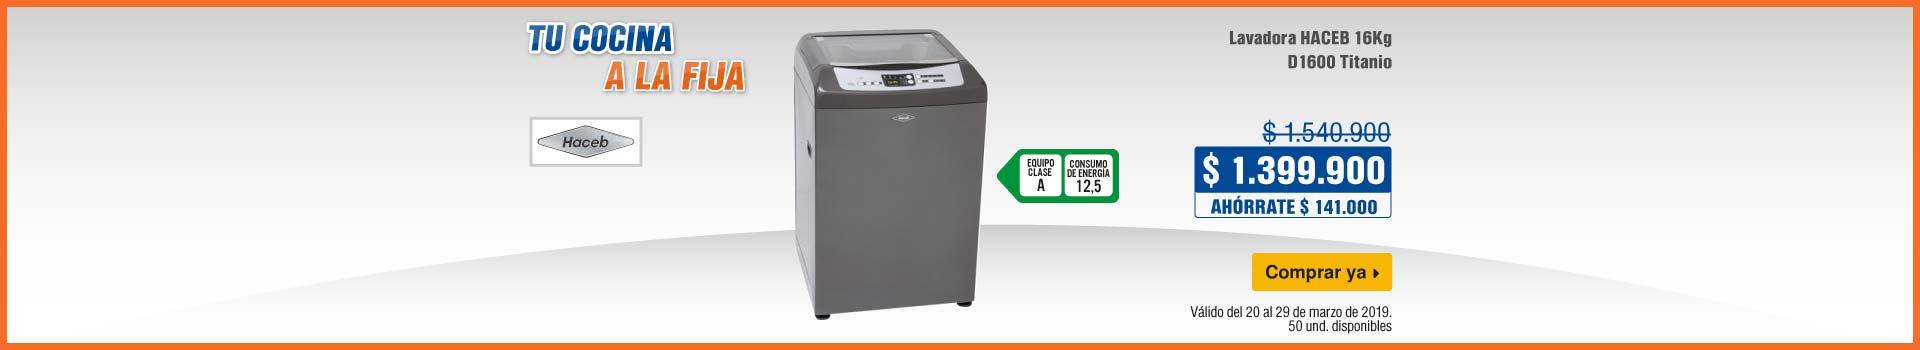 AK-KT-mayores-2-ELECT-BCAT-lavadoras-haceb-200319